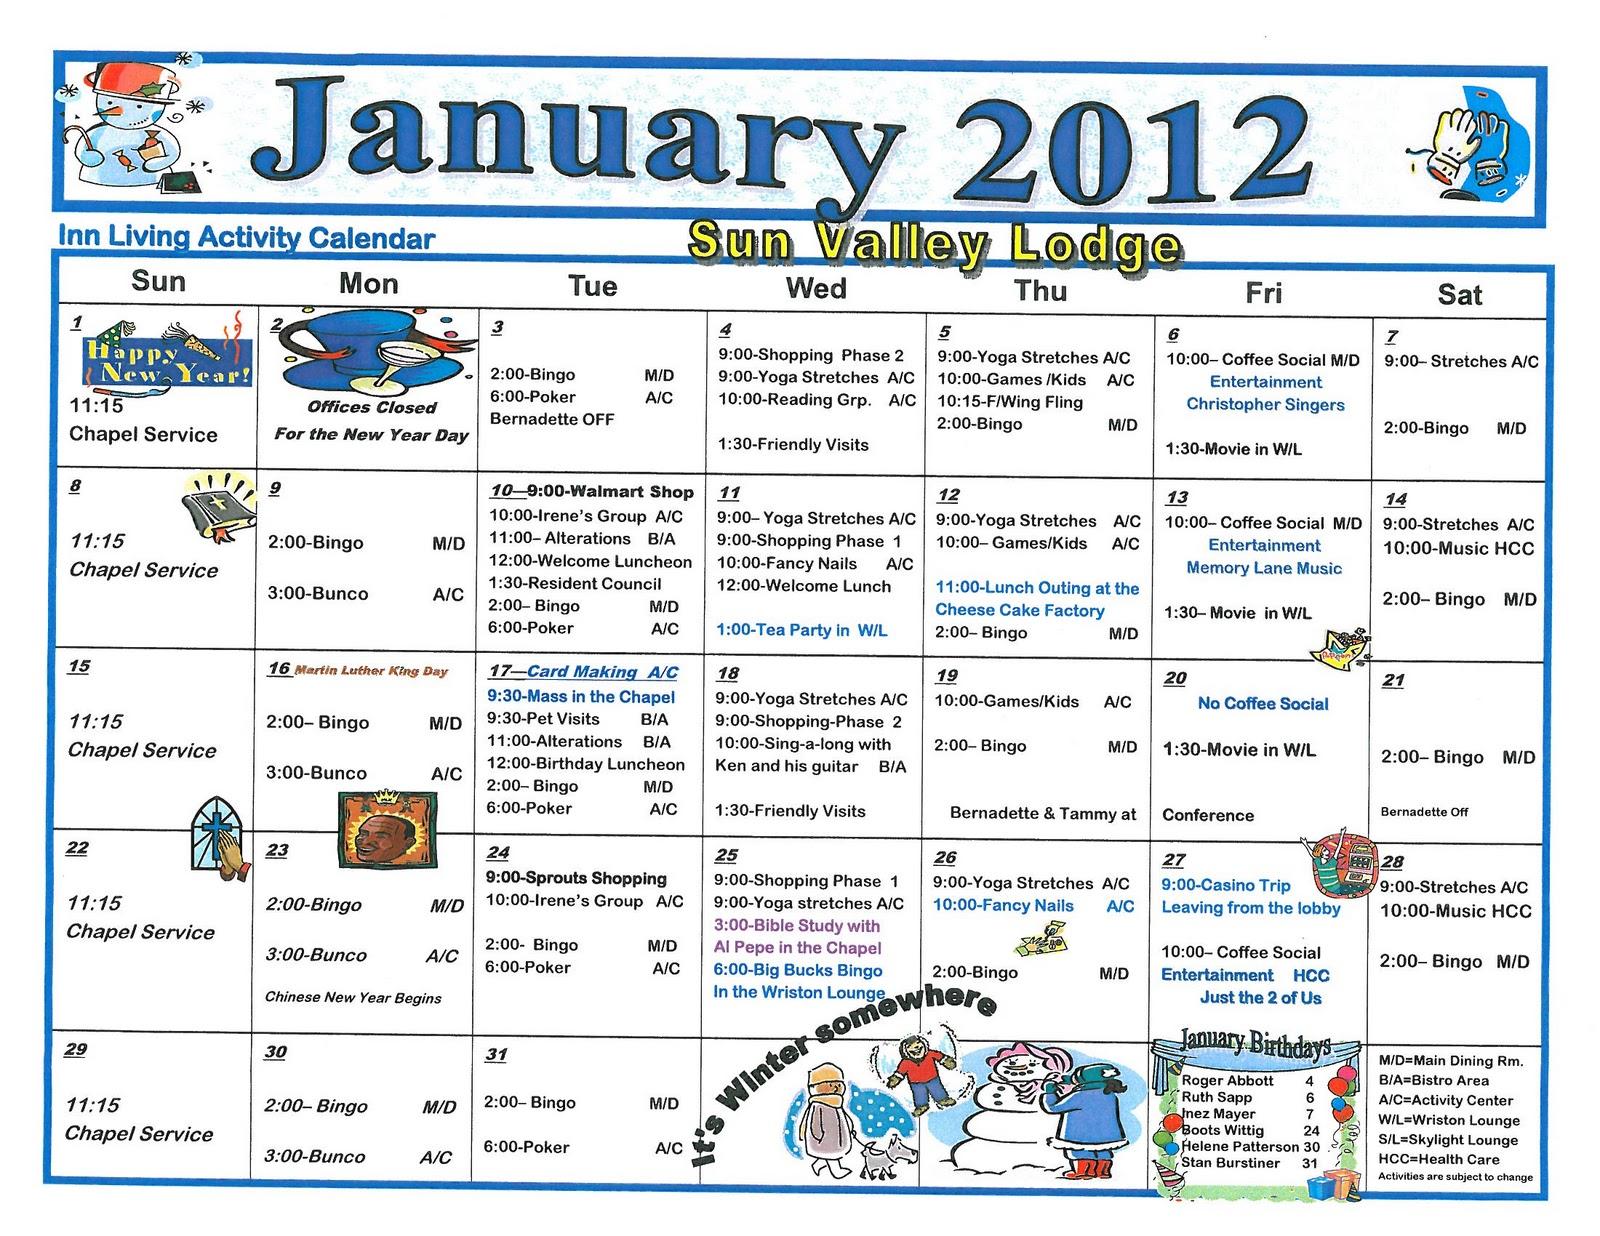 January 2012 assisted living activity calendar welcome for Assisted living activity calendar template